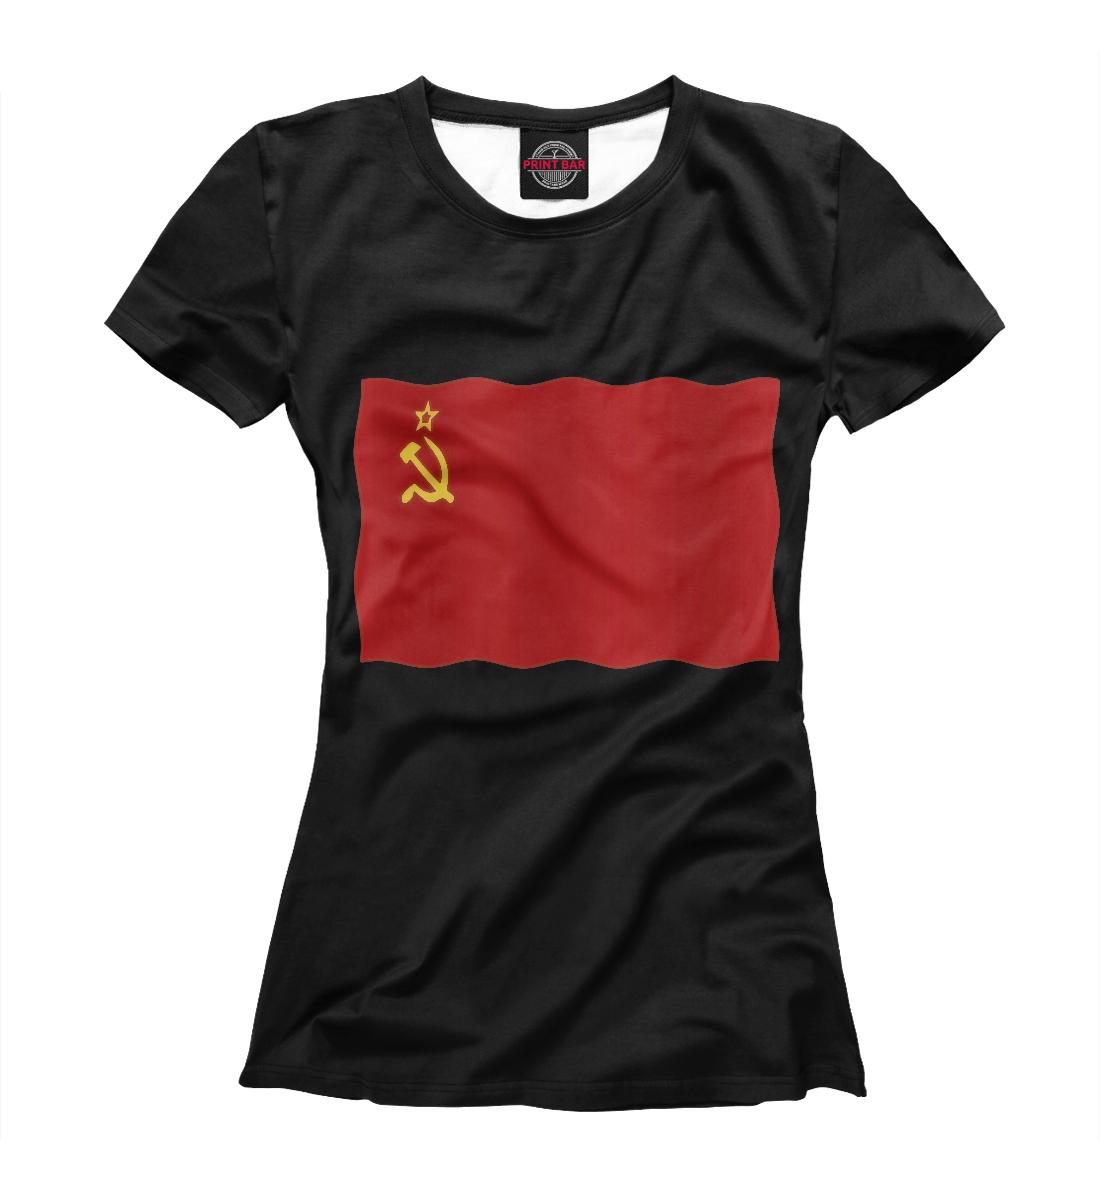 Купить Флаг СССР, Printbar, Футболки, SSS-626207-fut-1